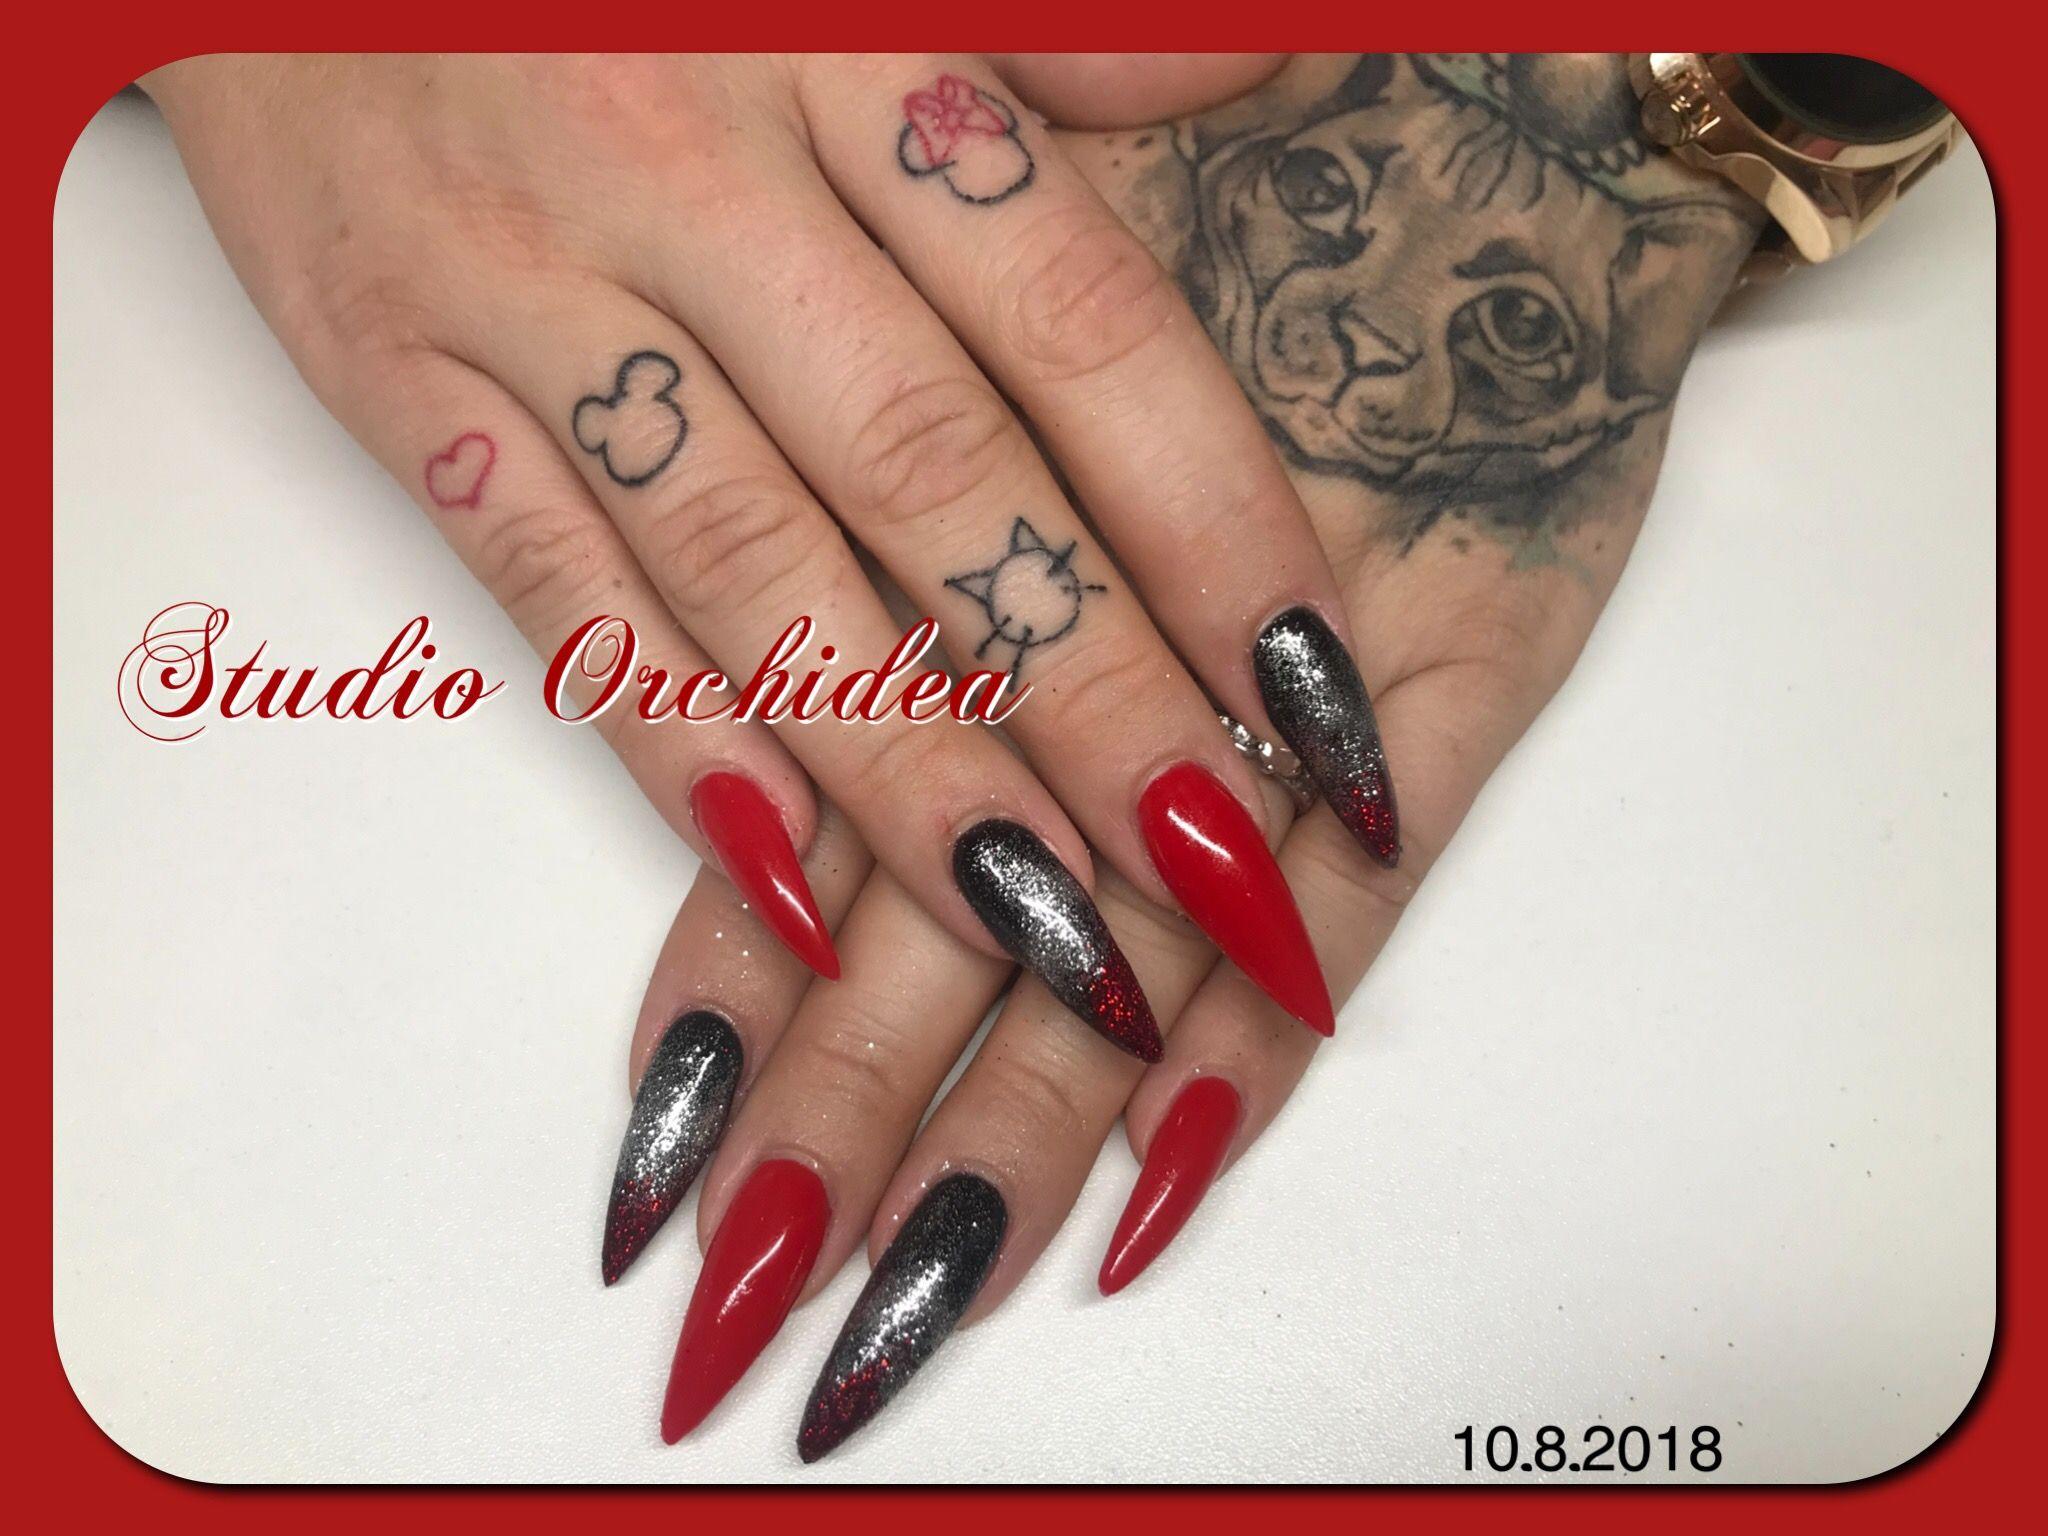 Modelaz Nehtu Gelem Studio Orchidea Marianske Lazne Hand Tattoos Henna Hand Tattoo Hand Henna